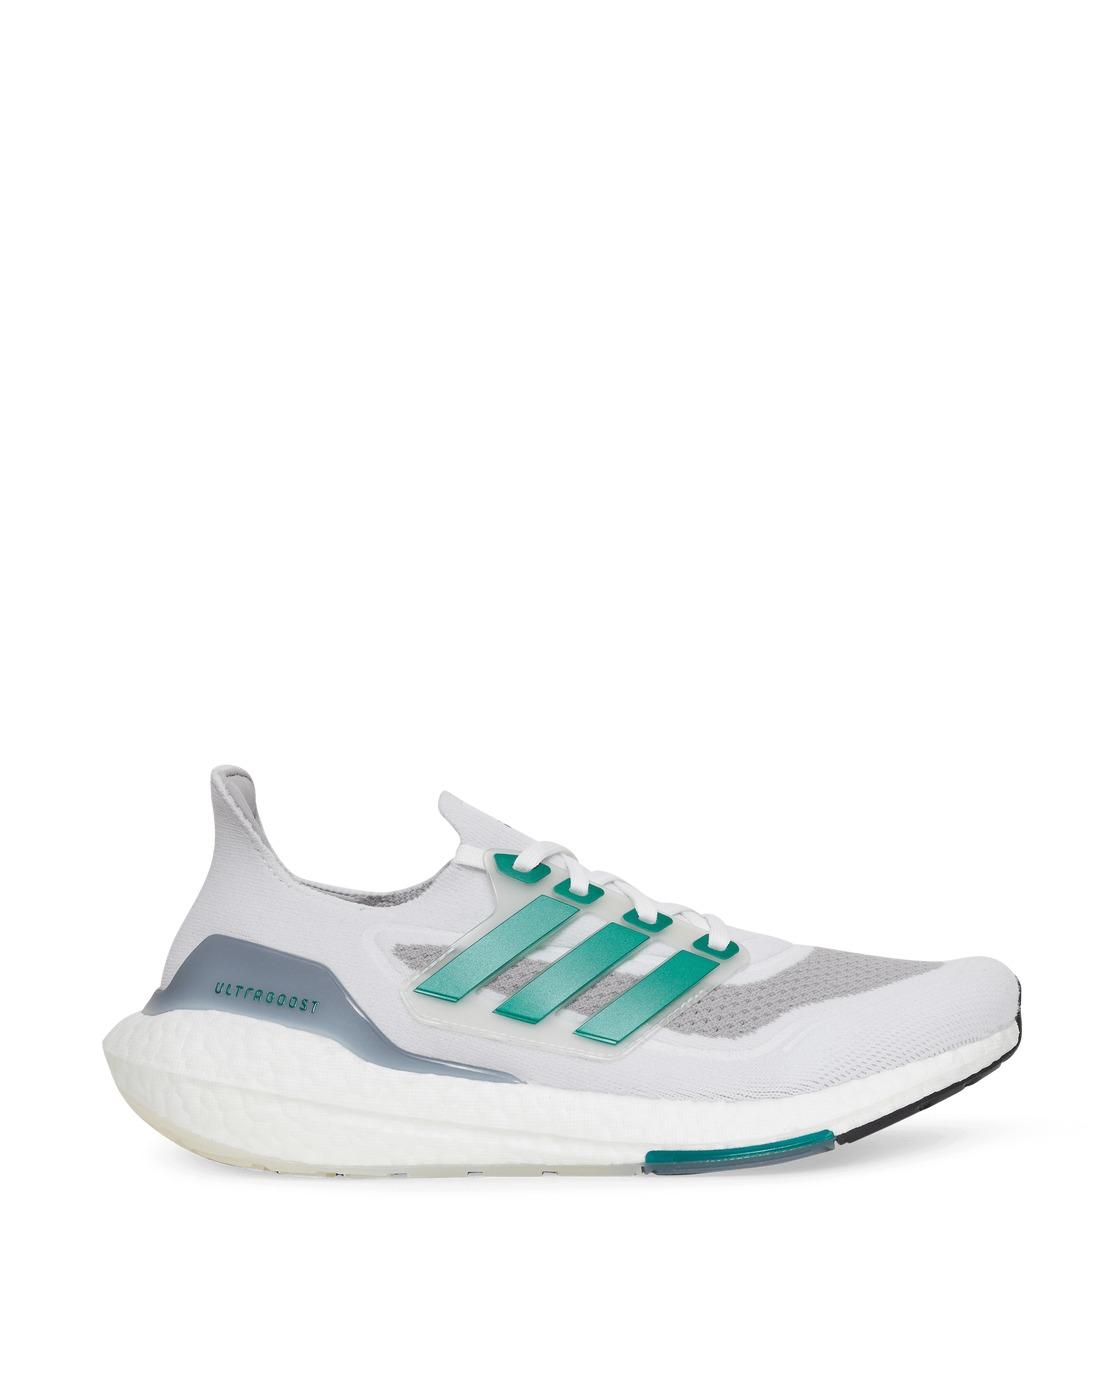 Photo: Adidas Originals Ultraboost 21 Sneakers Ftwr White/Sub Green 41